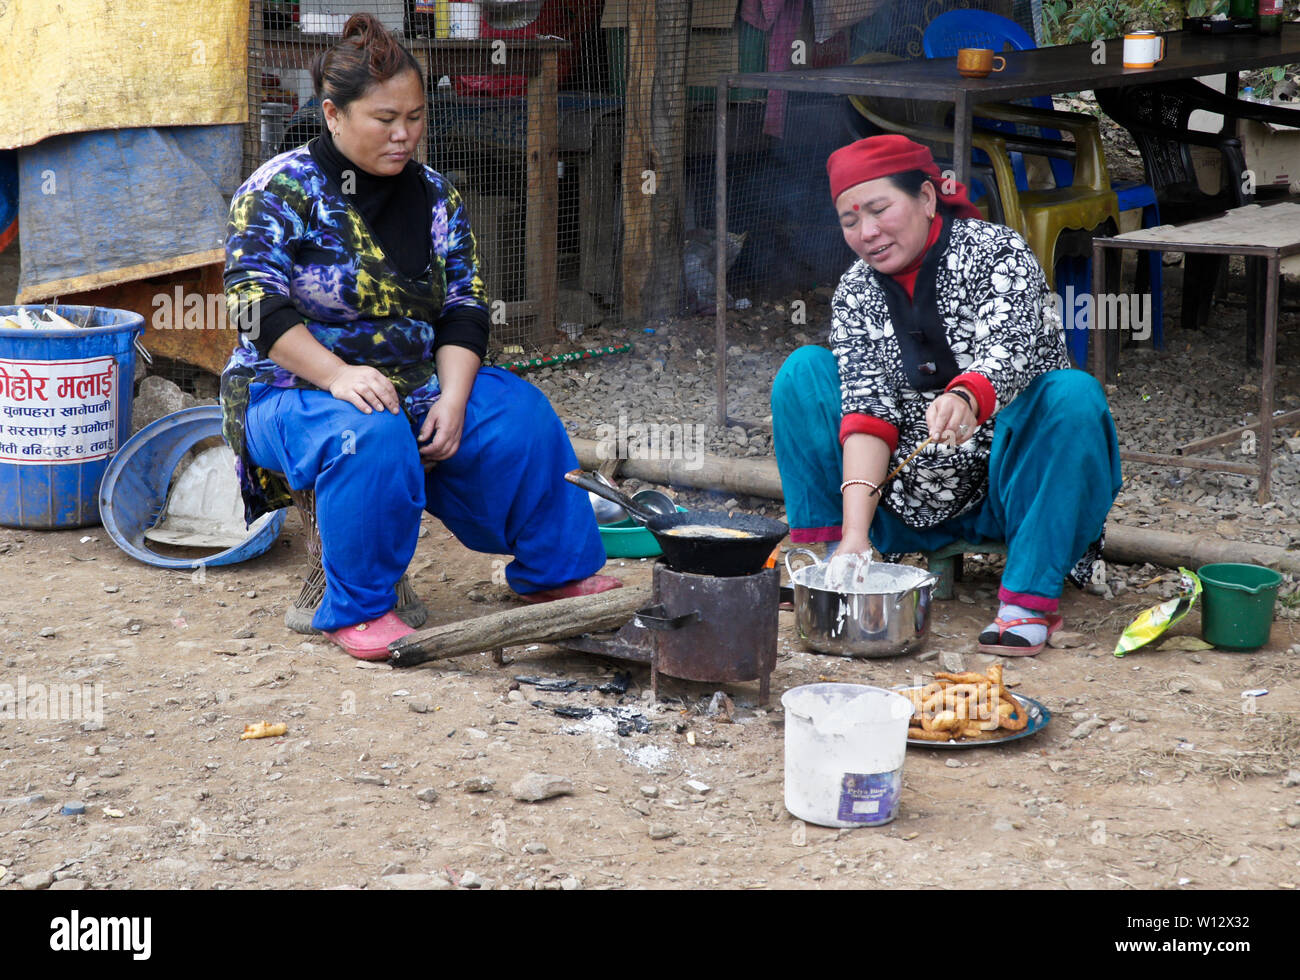 697d533b8 Women in traditional dress making sel (fried dough) at a roadside  restaurant in rural